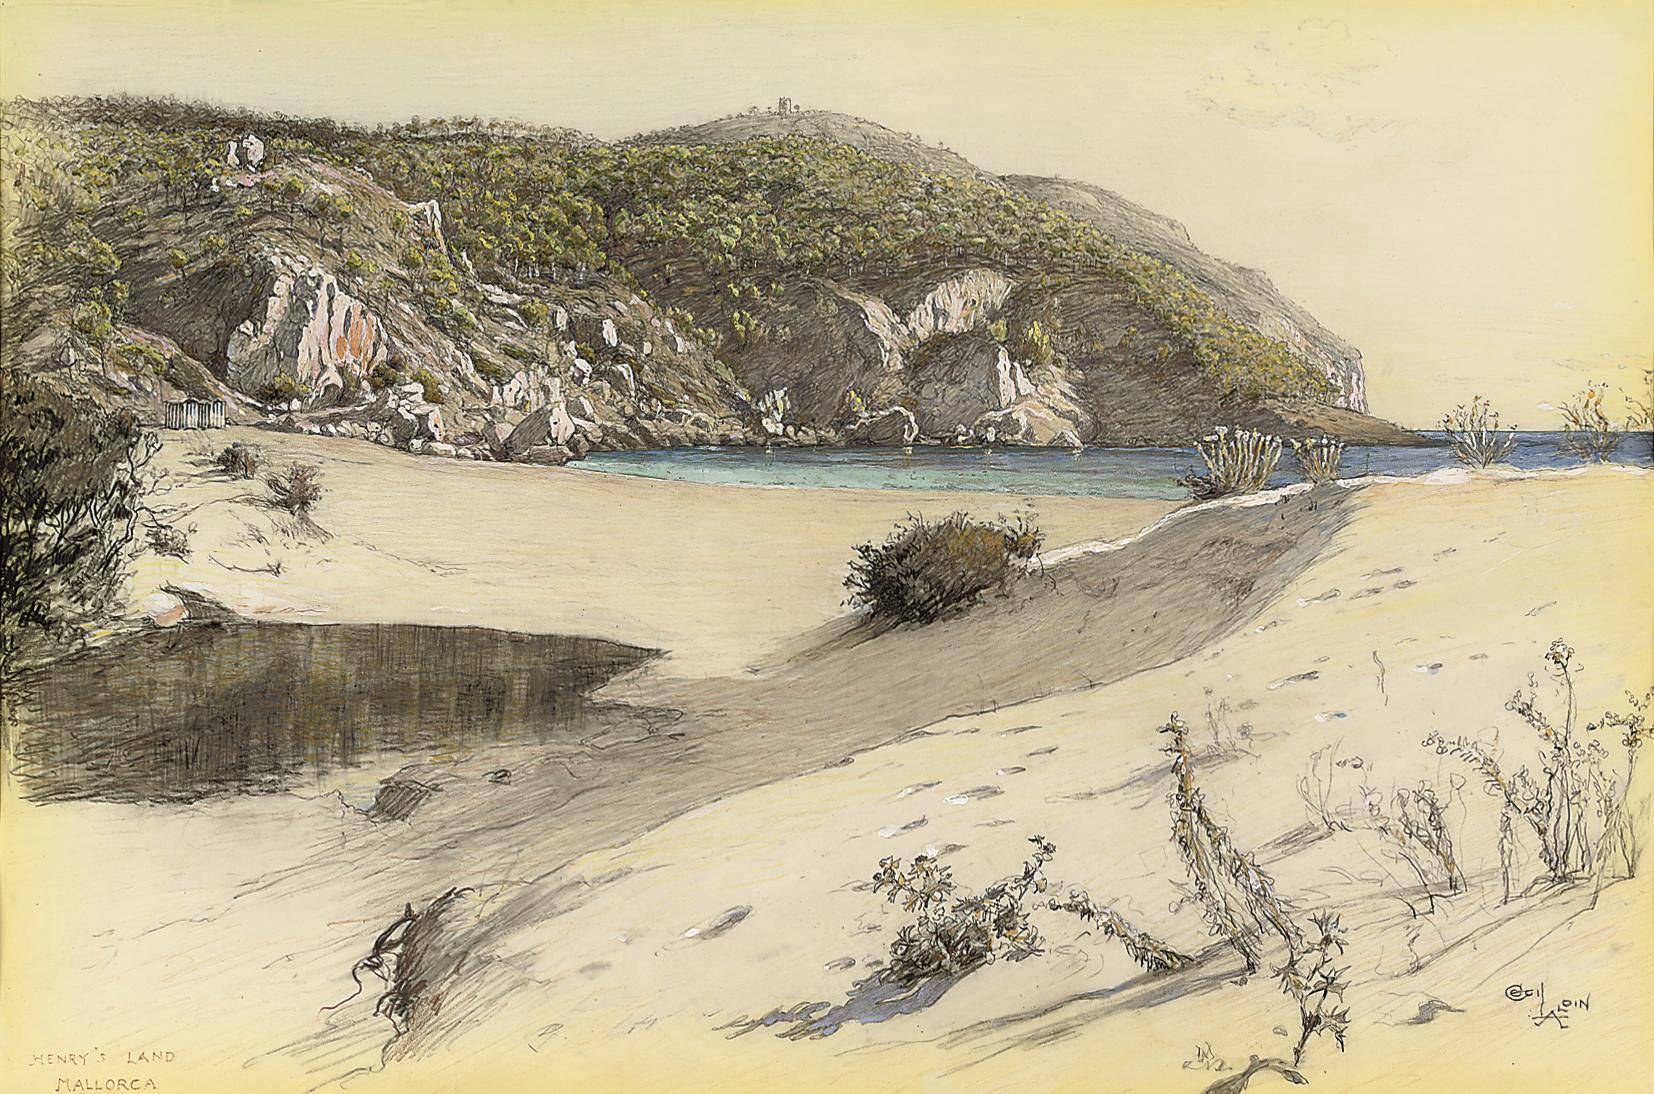 Henry's Land, Mallorca